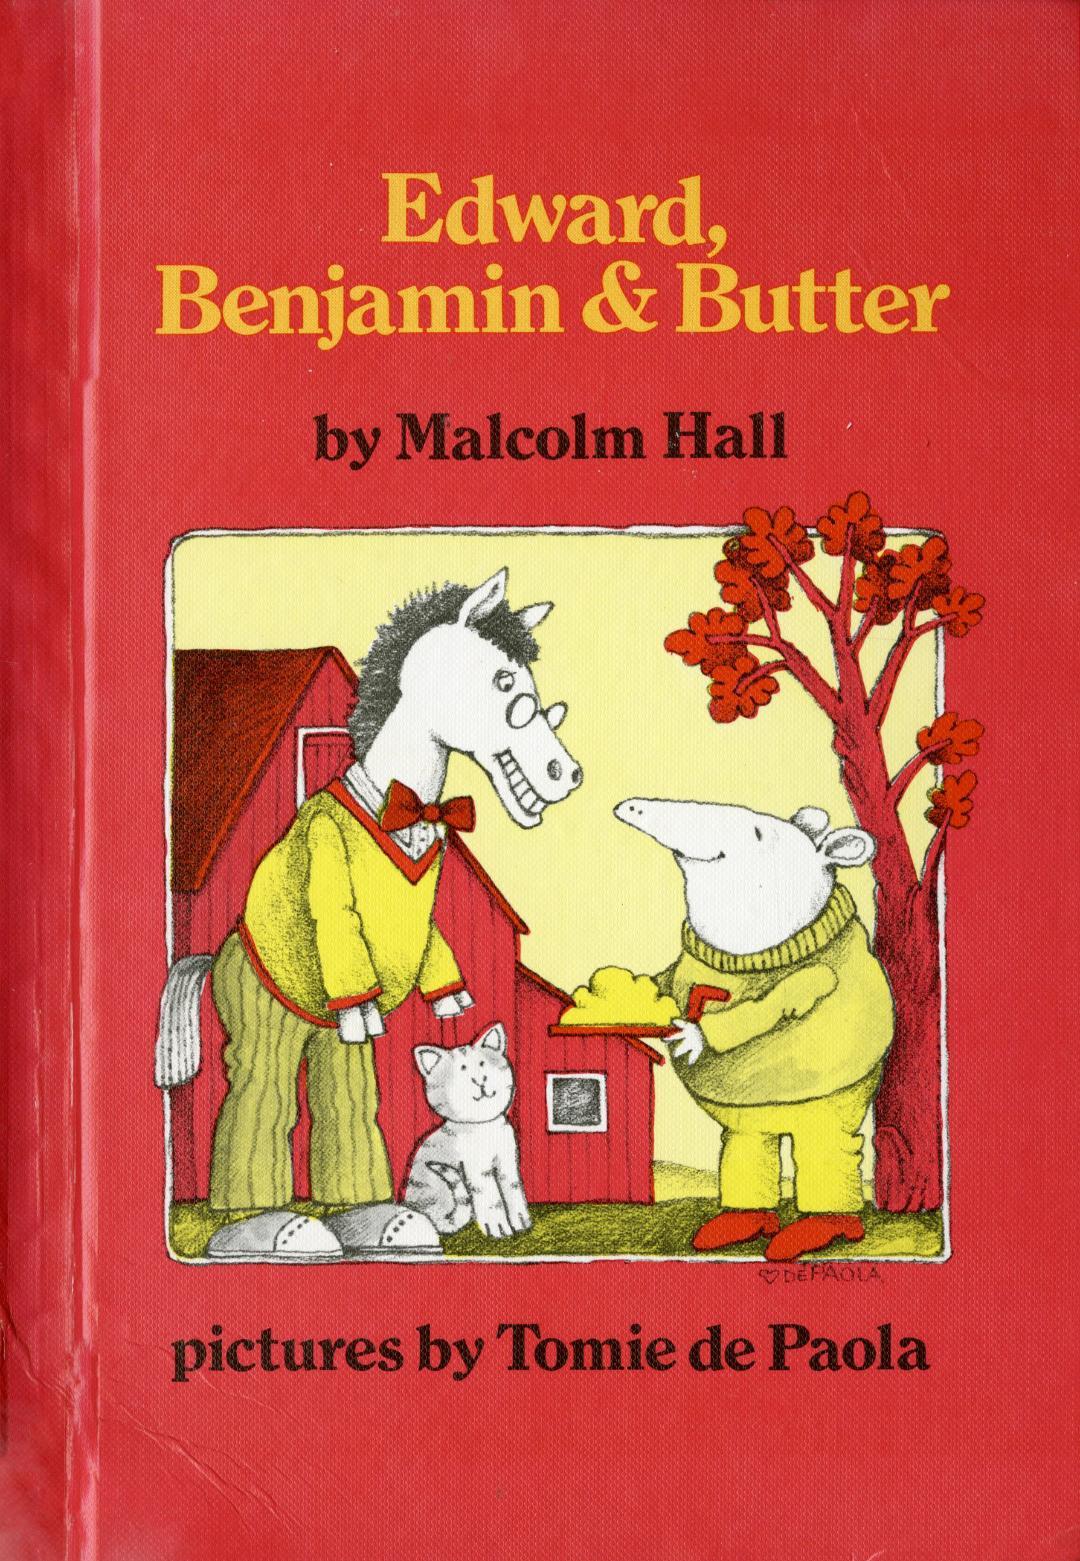 Edward, Benjamin & Butter HC.jpg